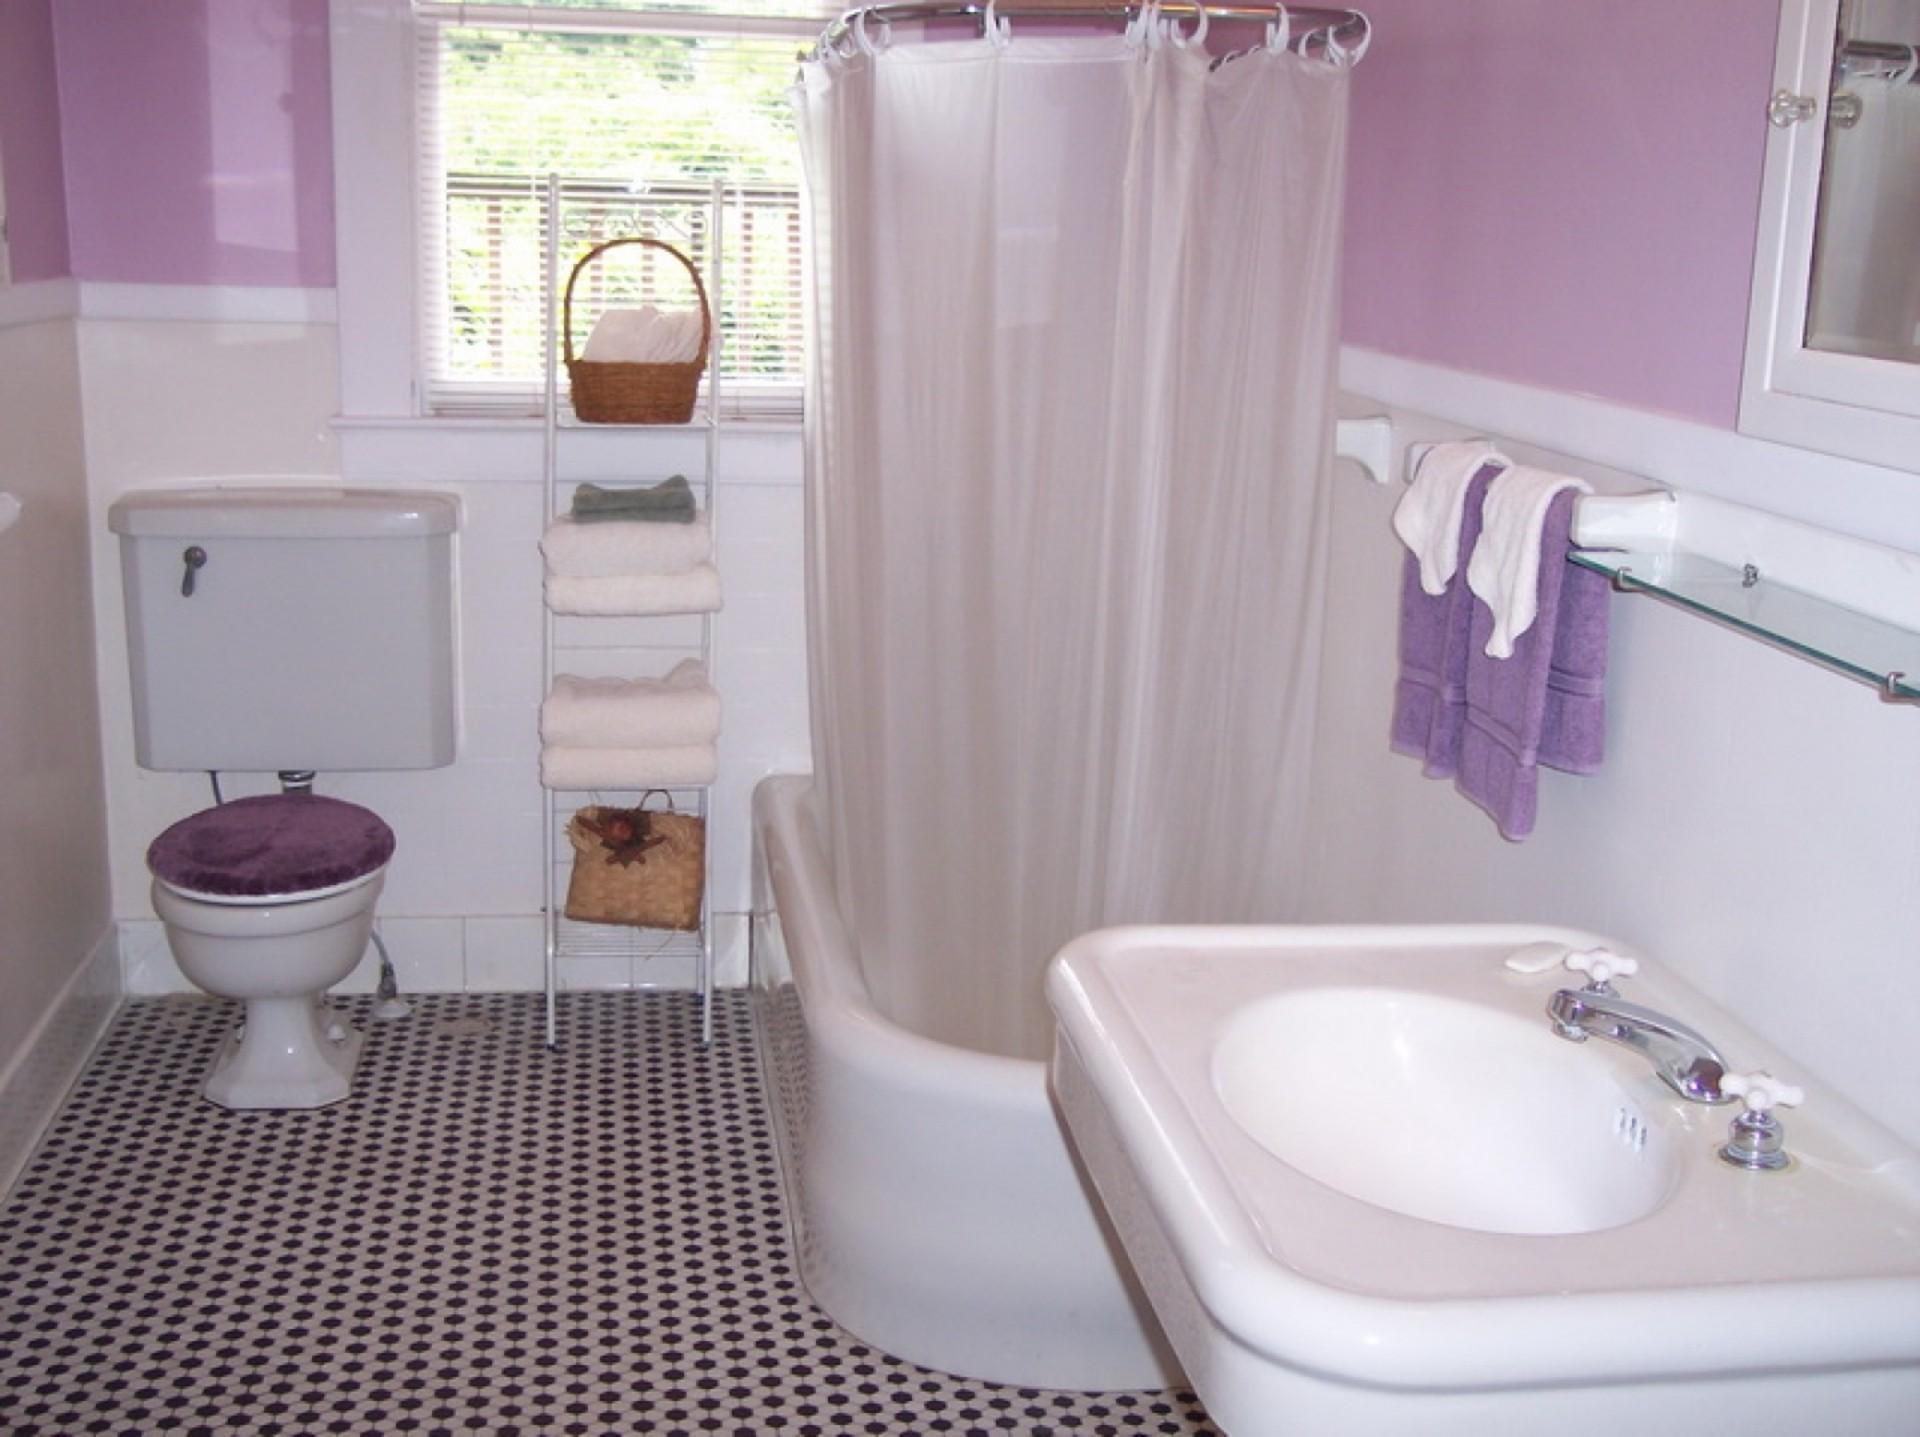 How to Refinish a Fiberglass Bathtub